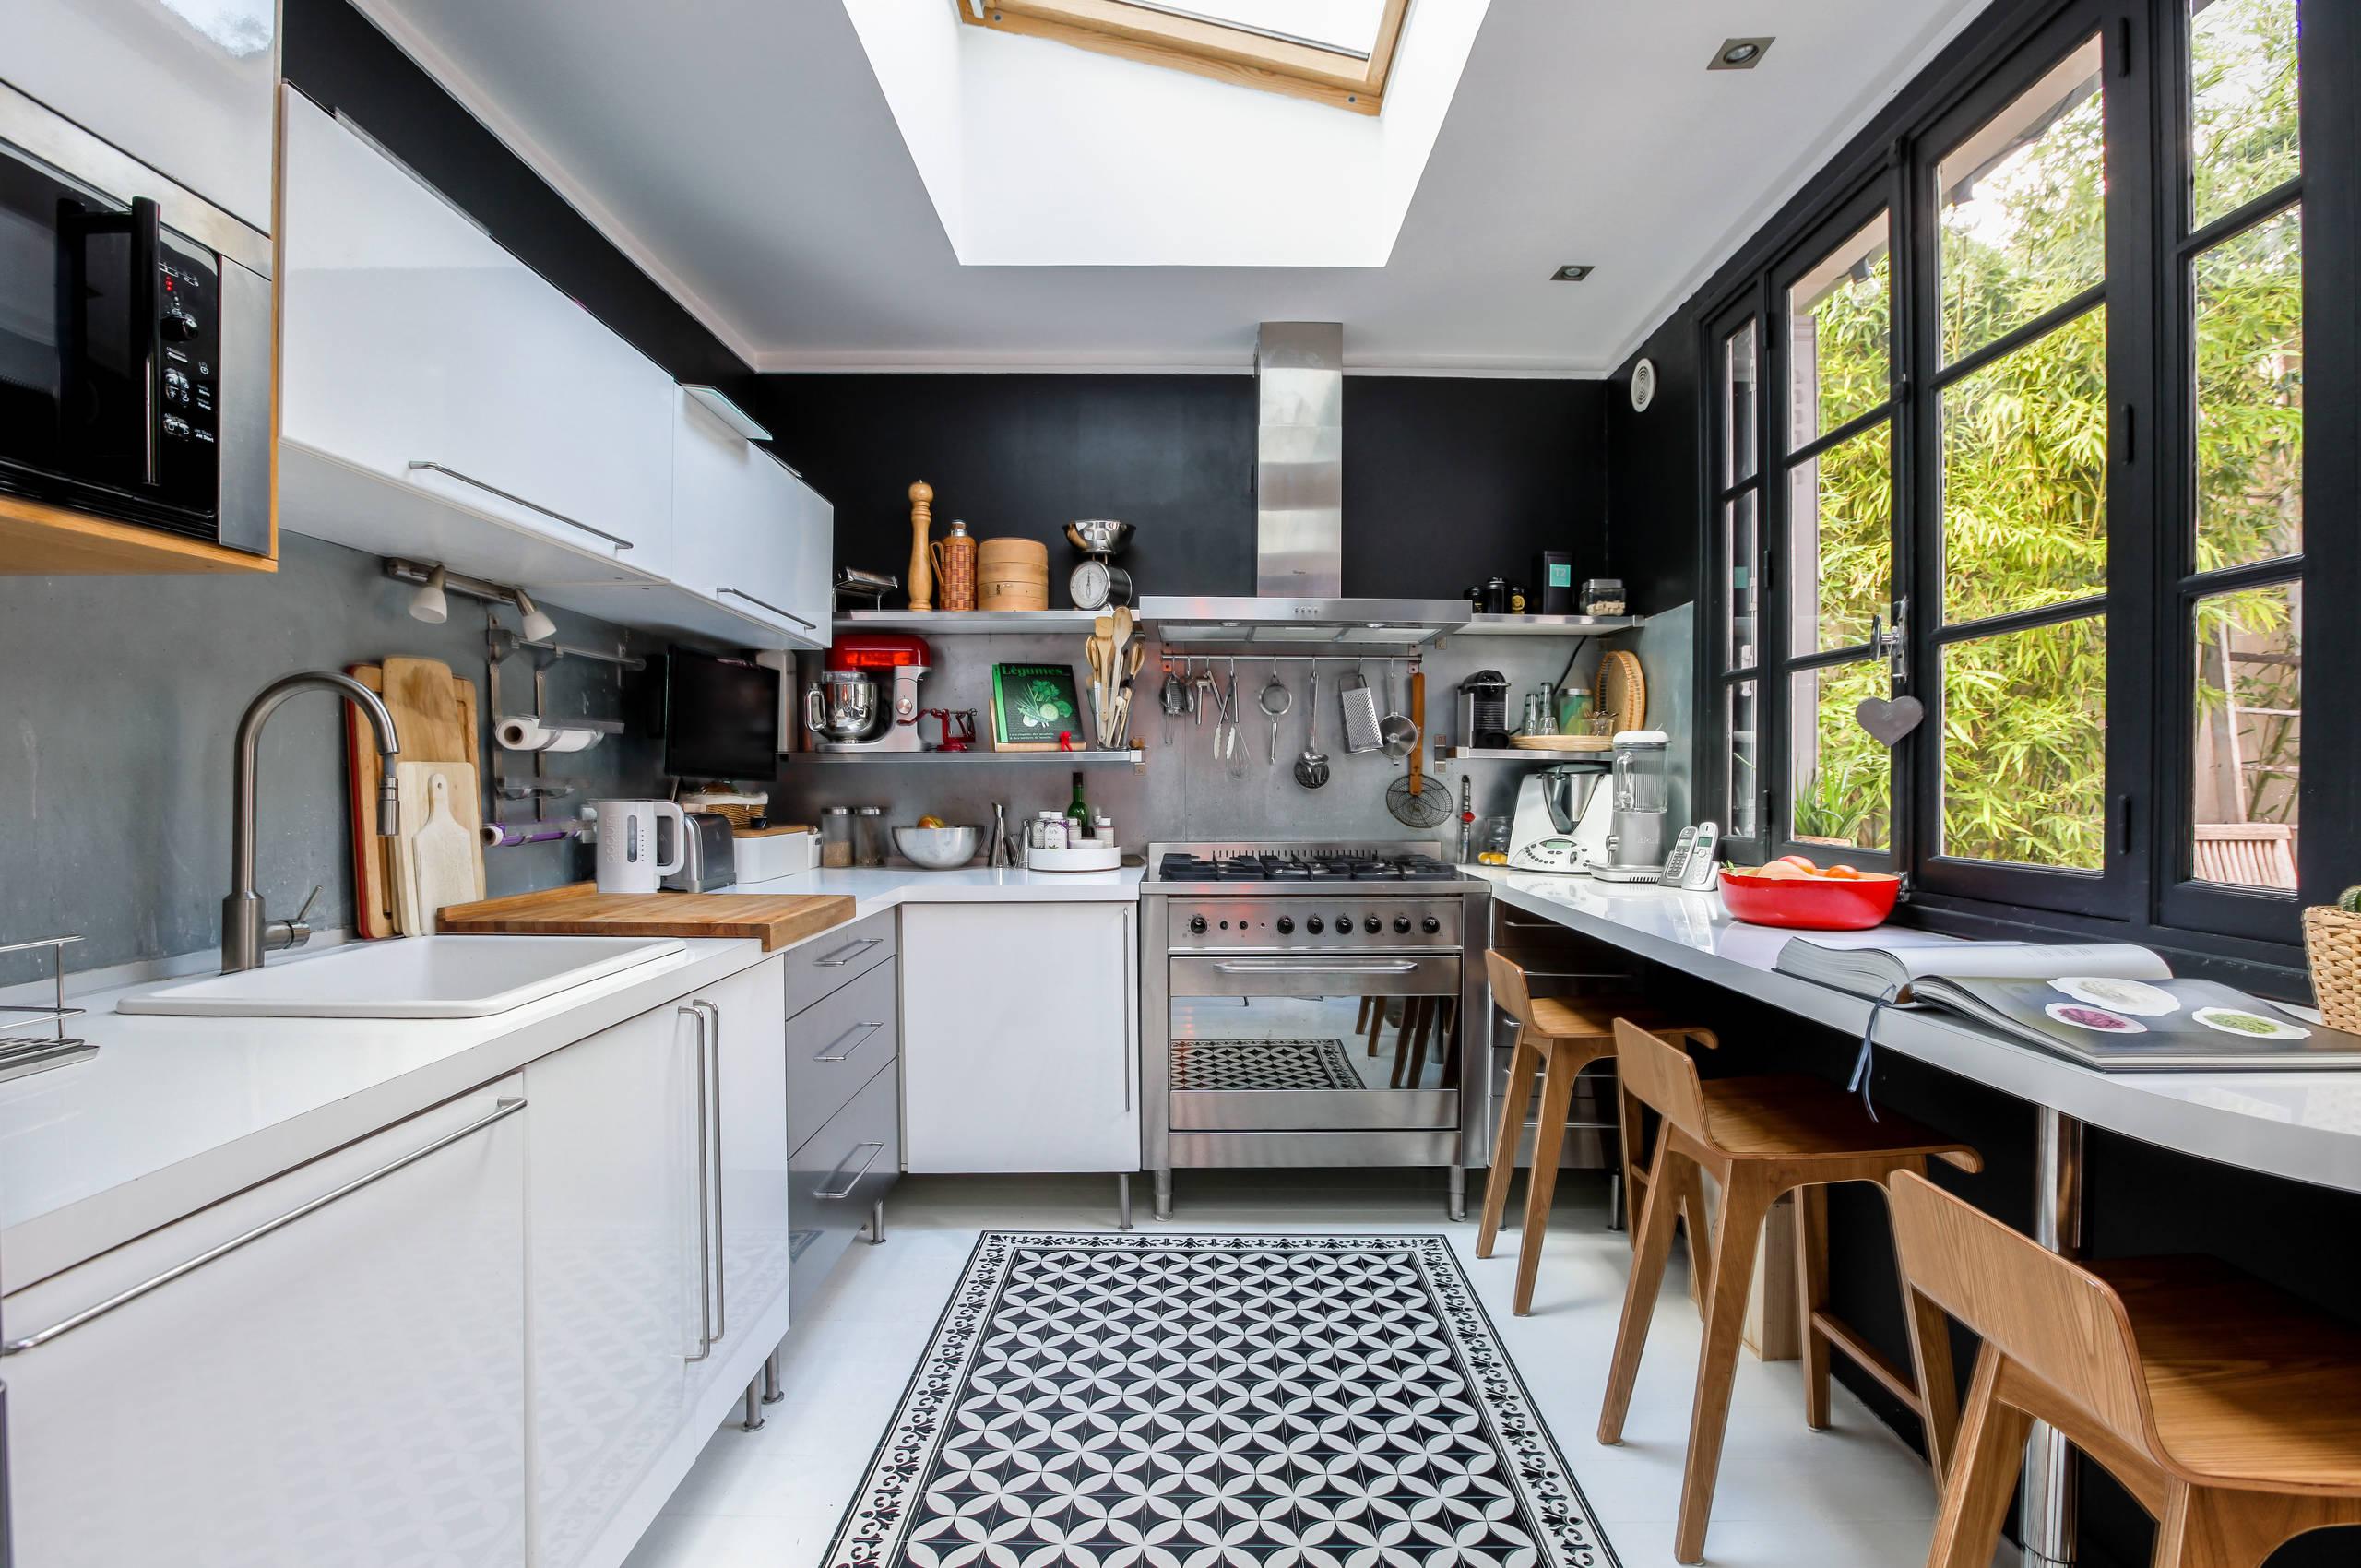 Maison 92 Contemporary Kitchen Paris By Aniss Studio Houzz